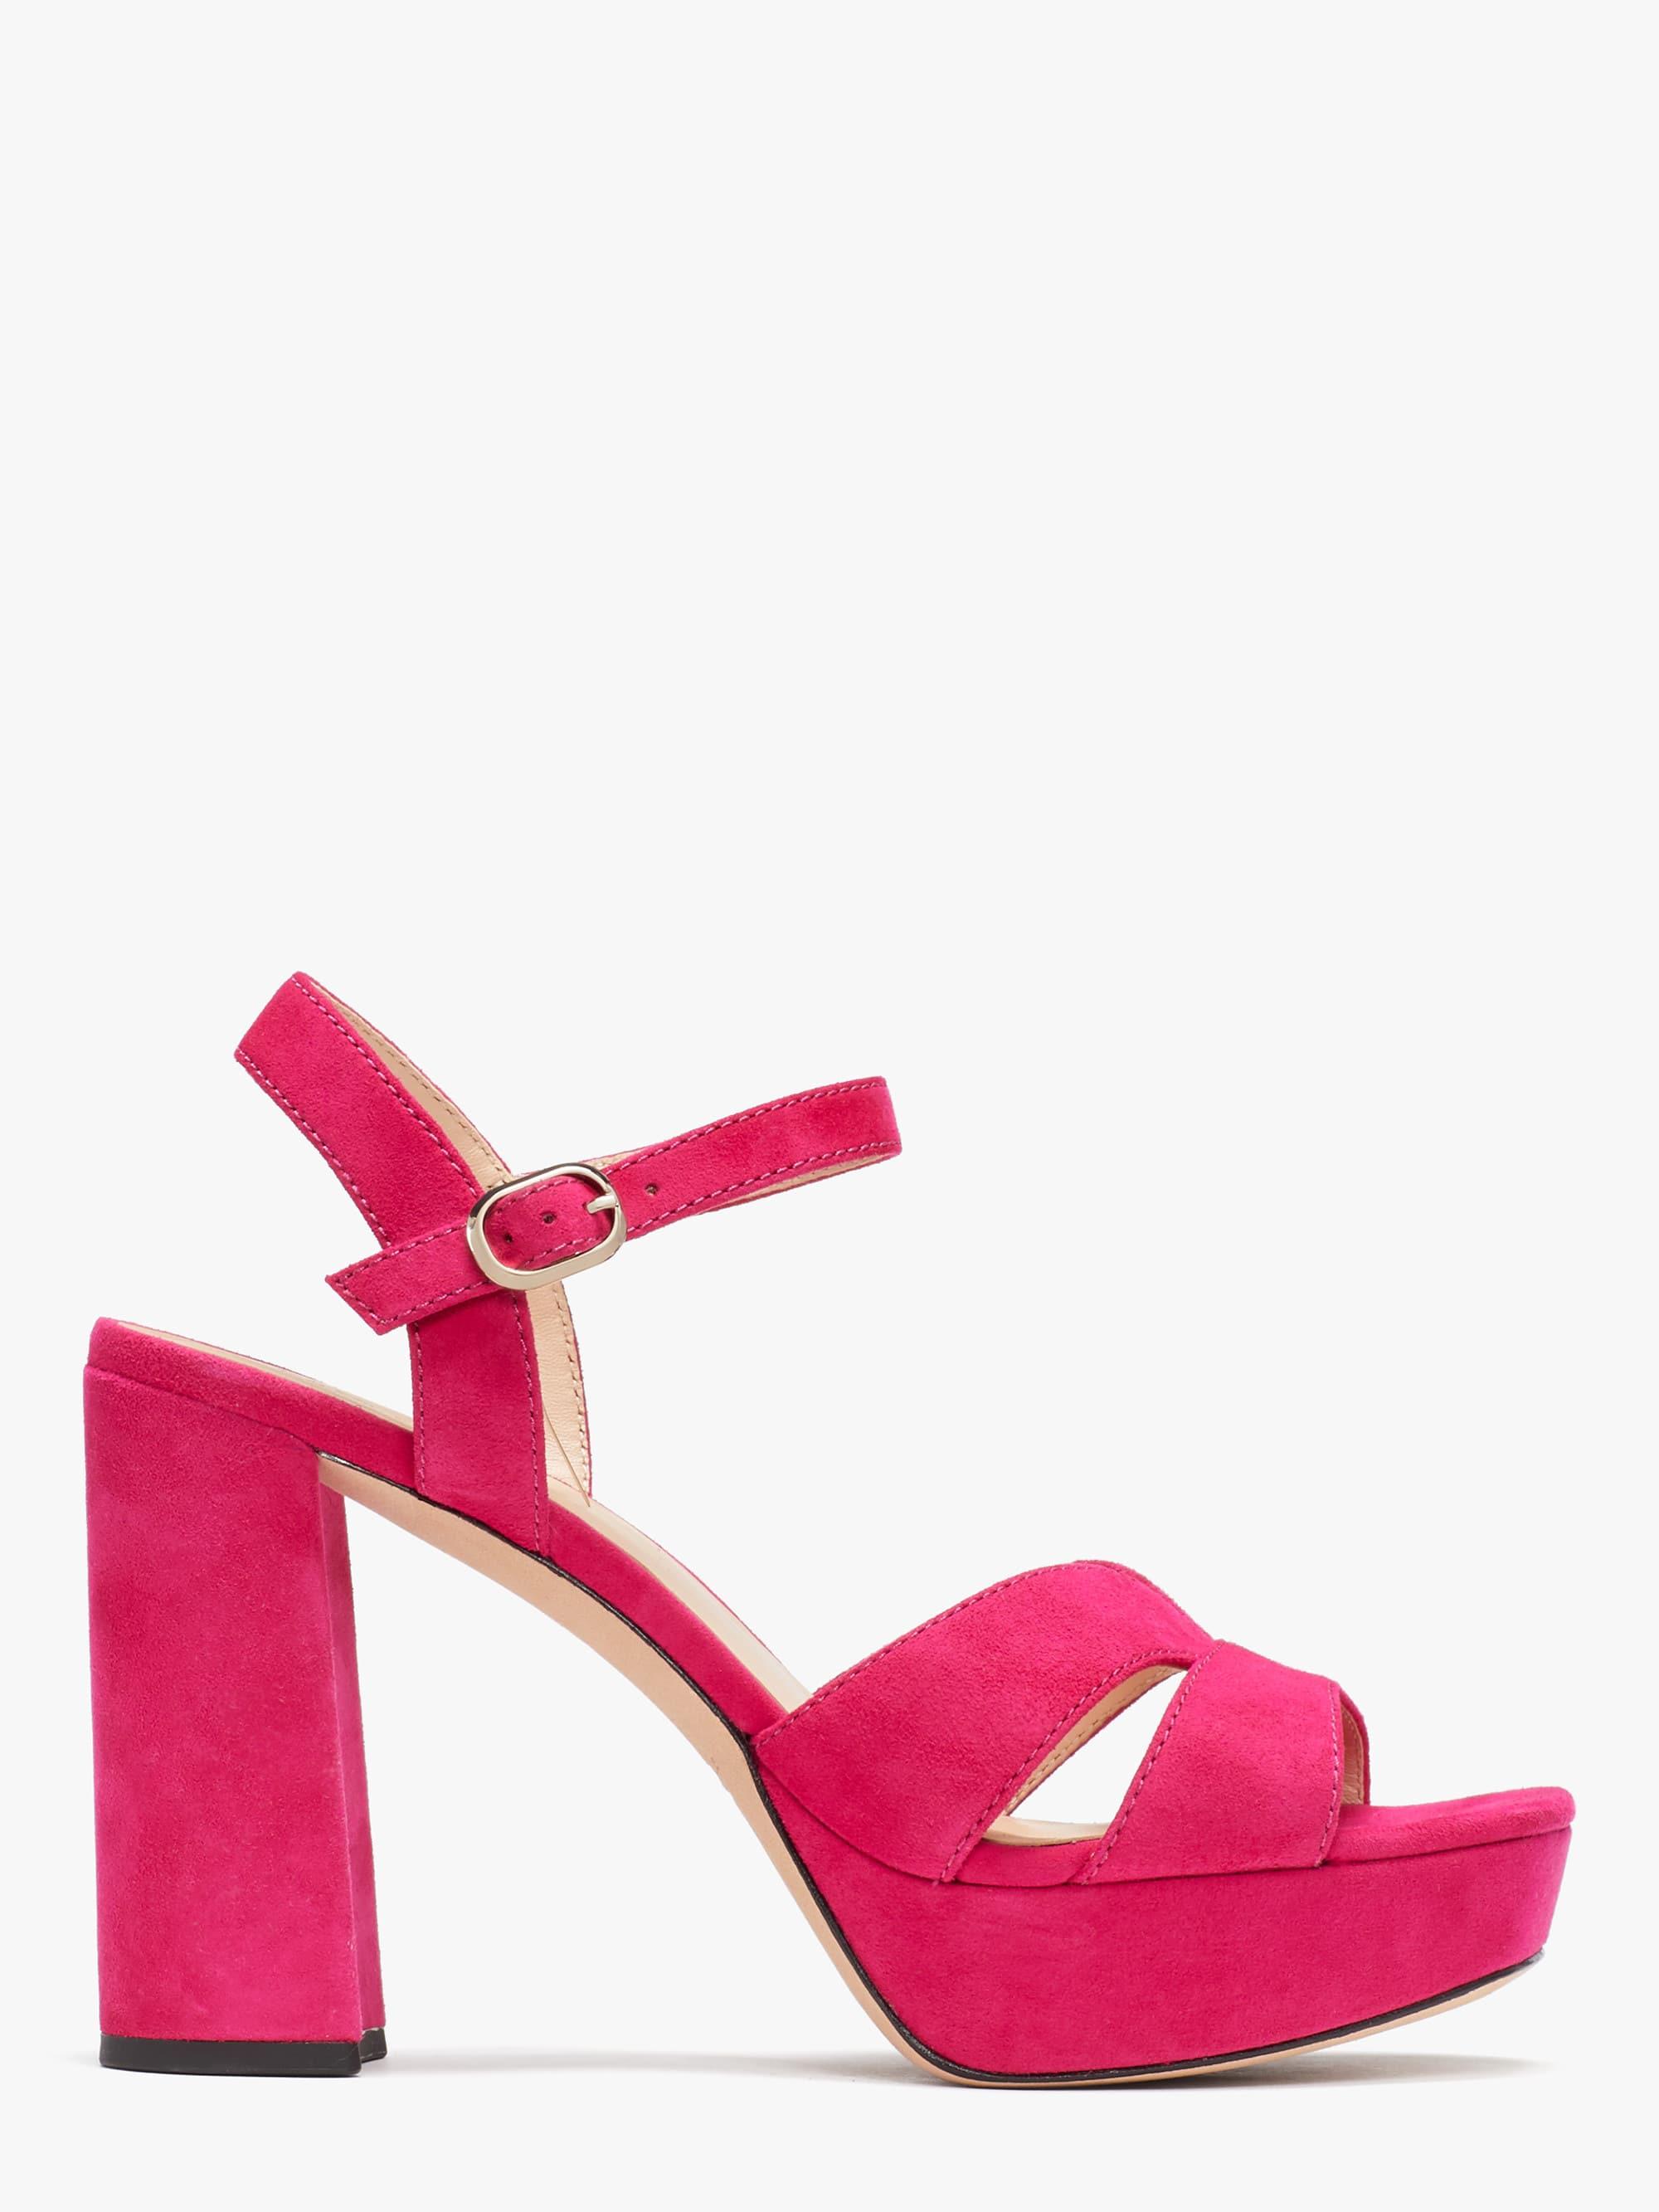 Kate spade delight sandals